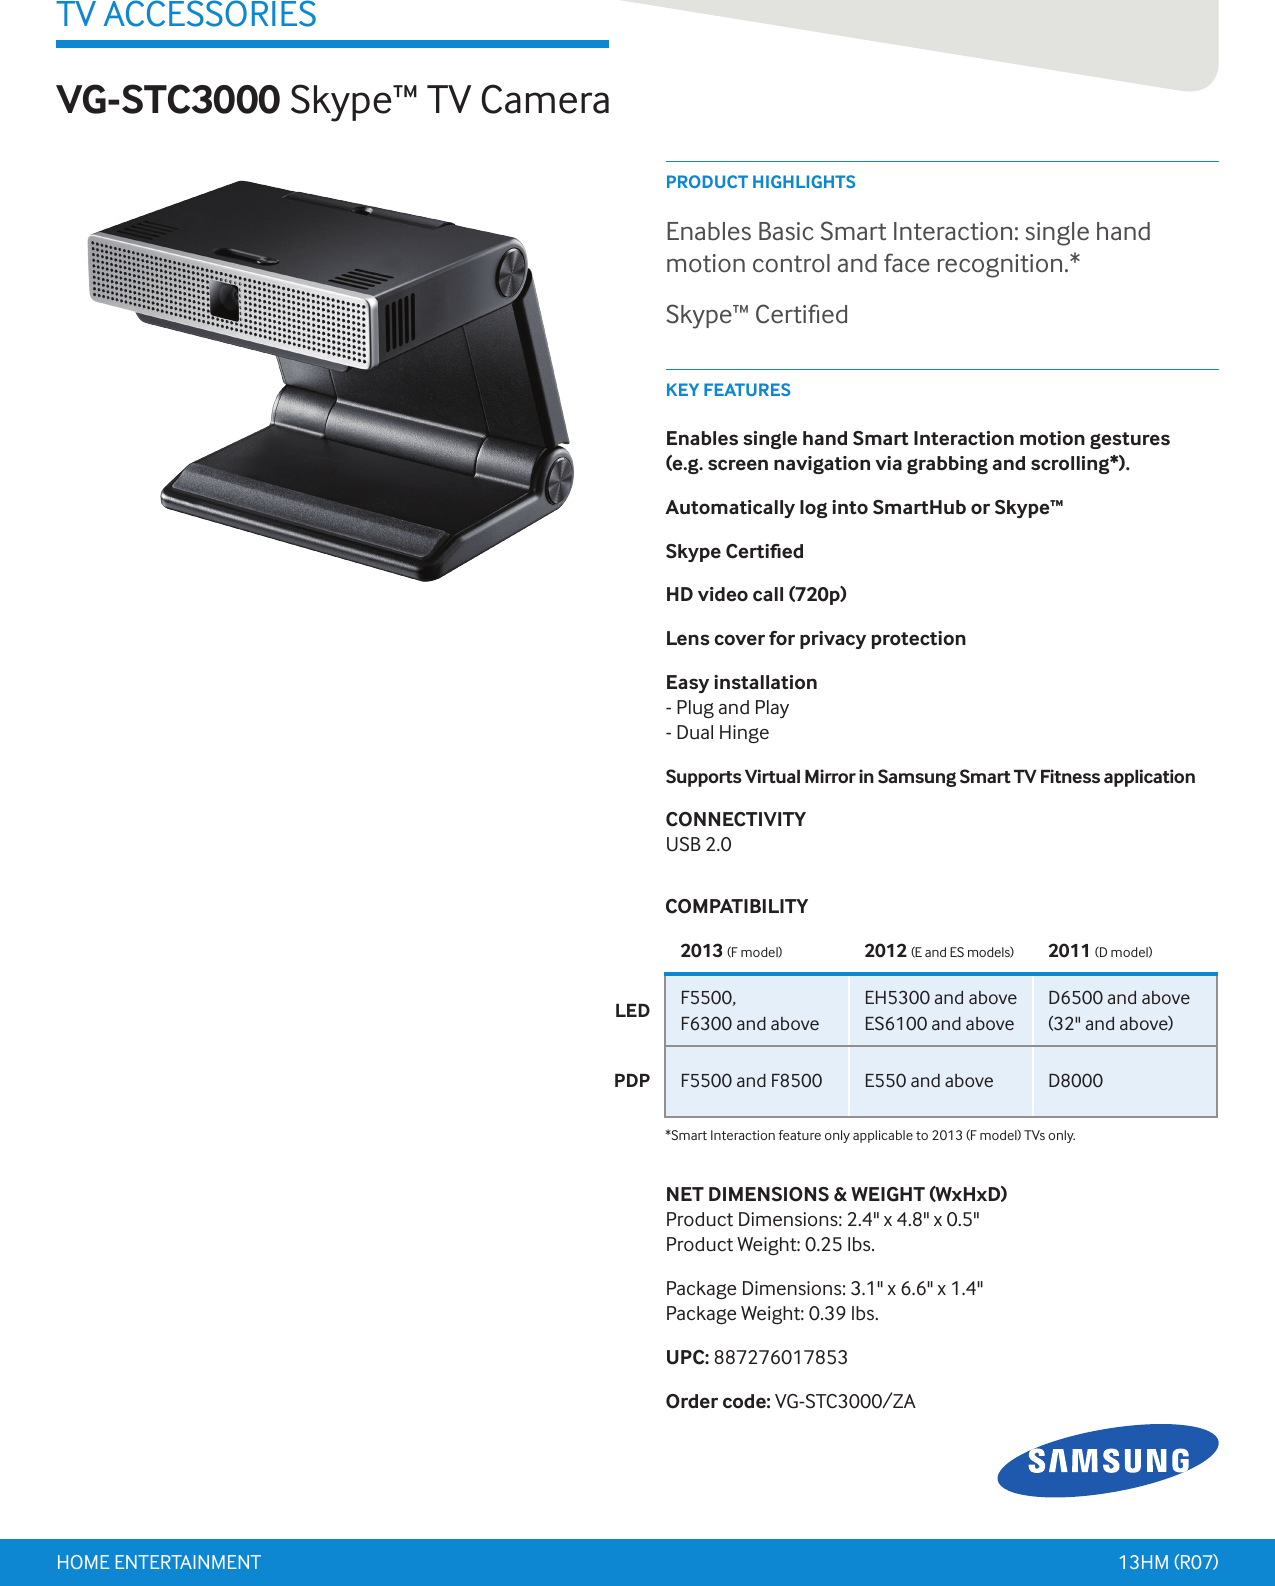 Samsung Skype Tv Camera Vgstc3000Za Users Manual